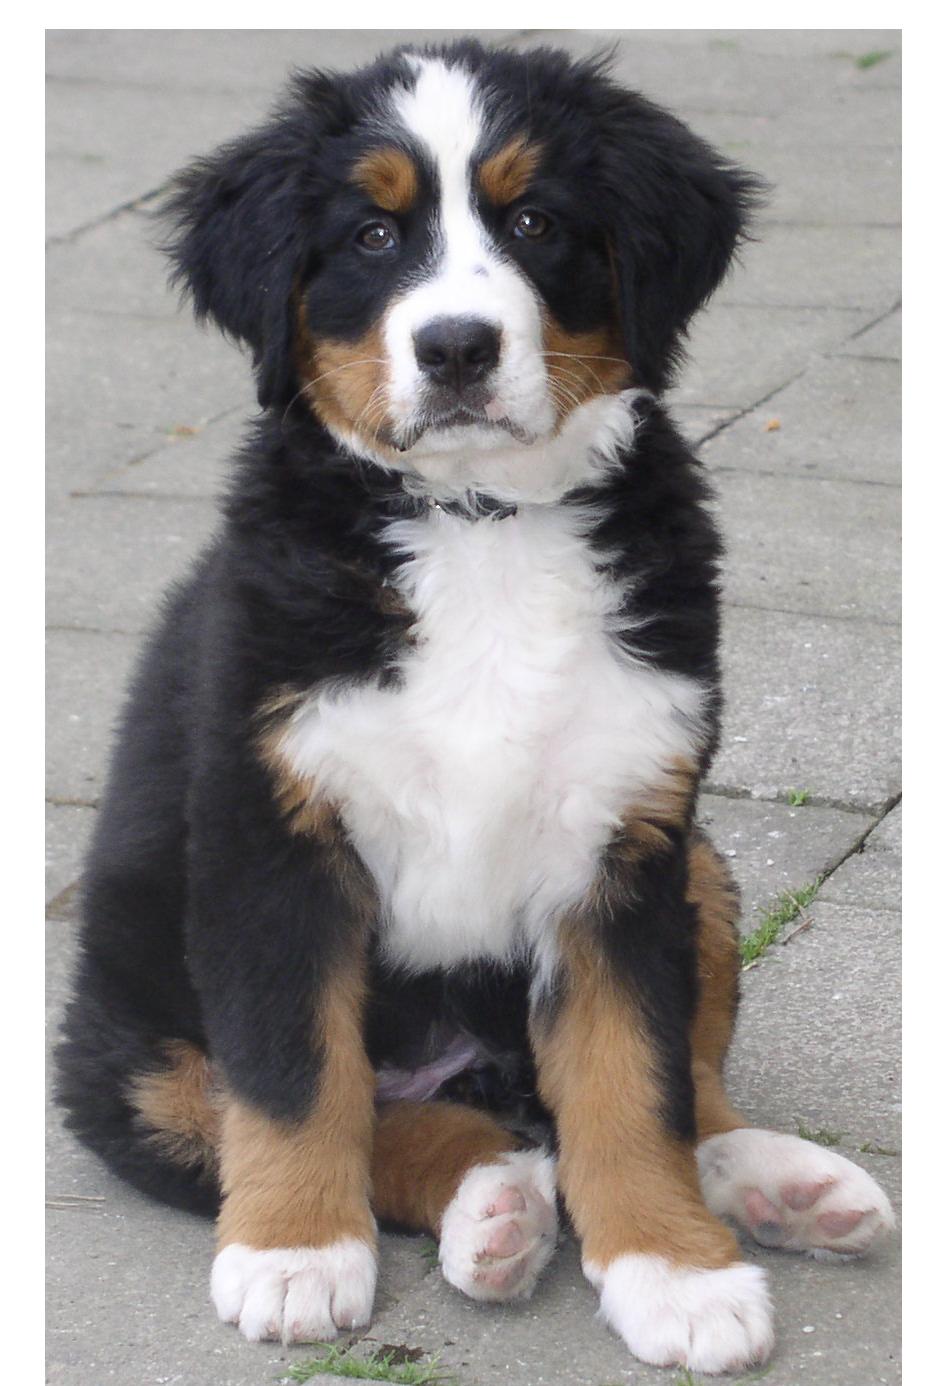 dog PNG image - Dog PNG